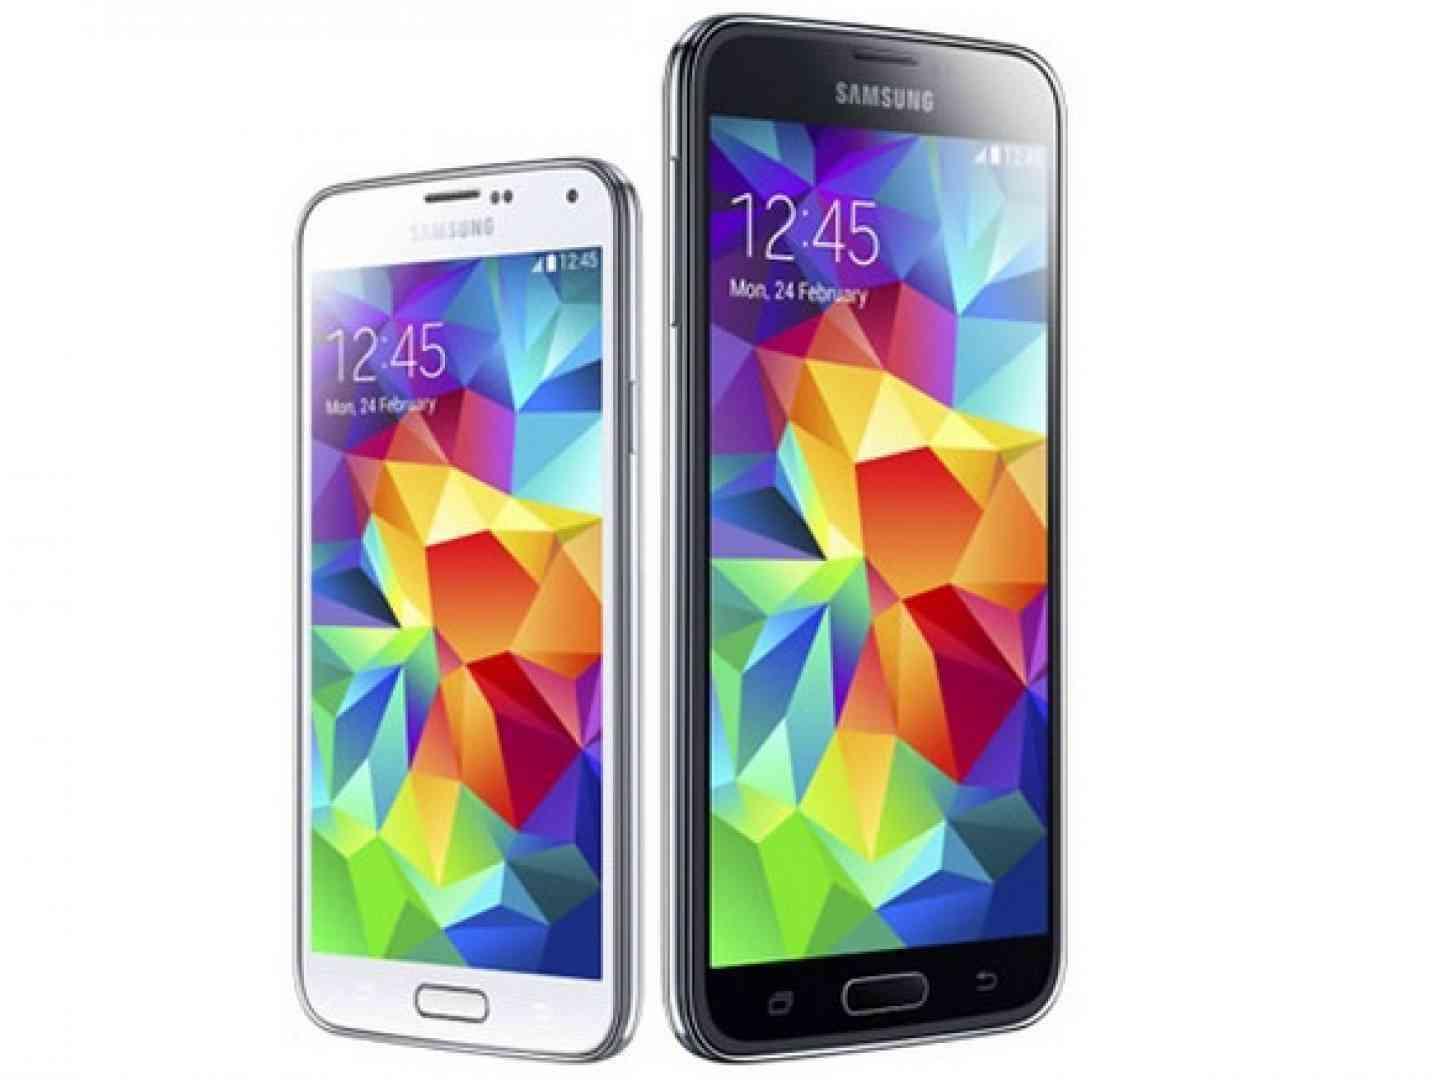 Samsung Galacy S5 and S5 mini